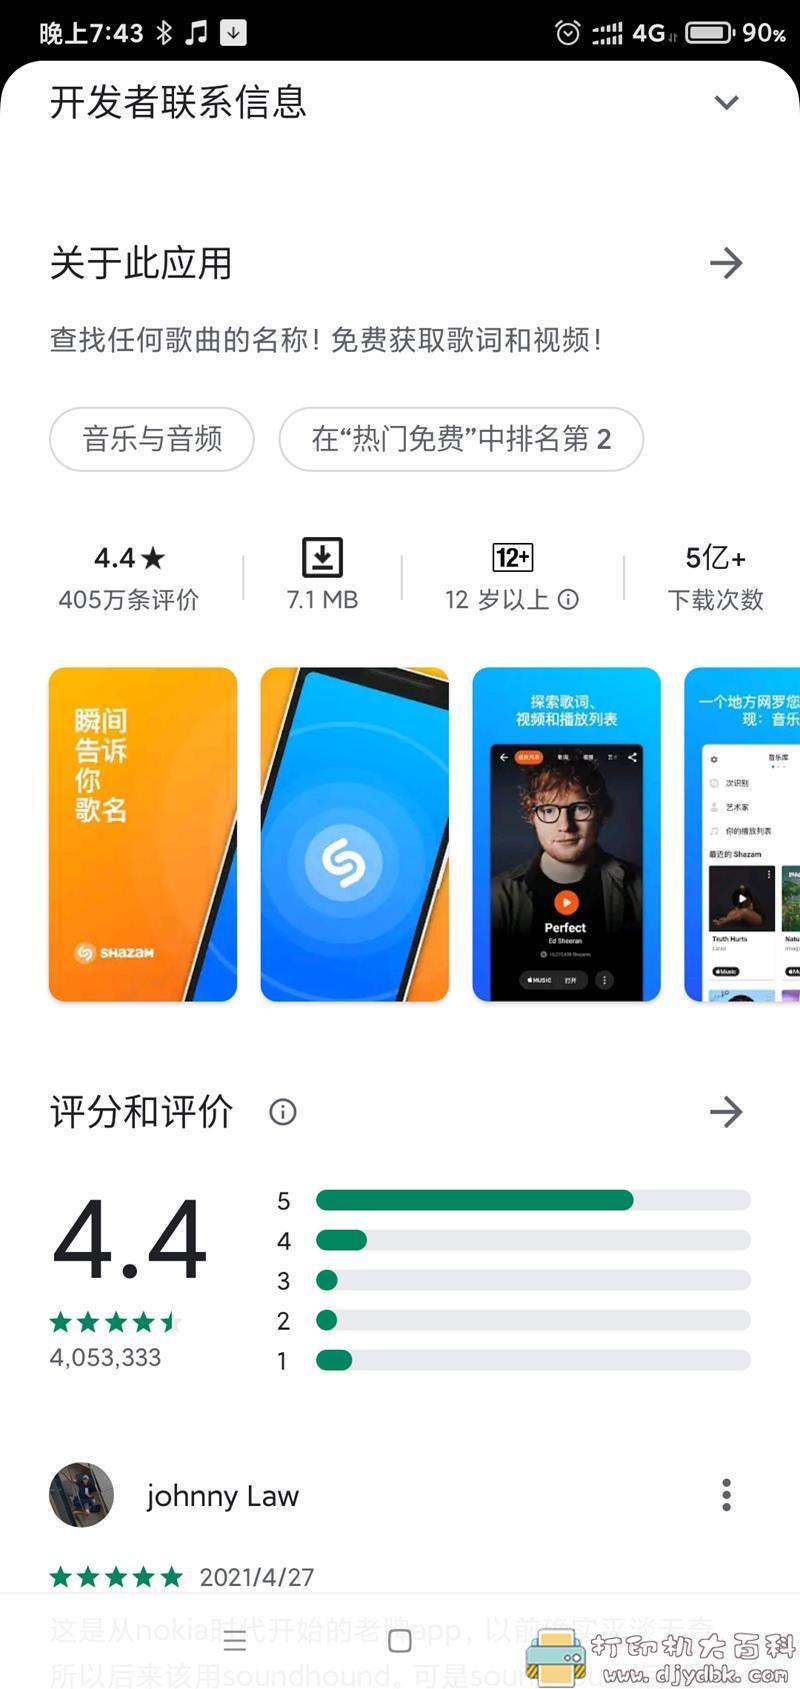 [Android]曲库丰富,识别能力出色:听歌识曲Shazam 配图 No.1